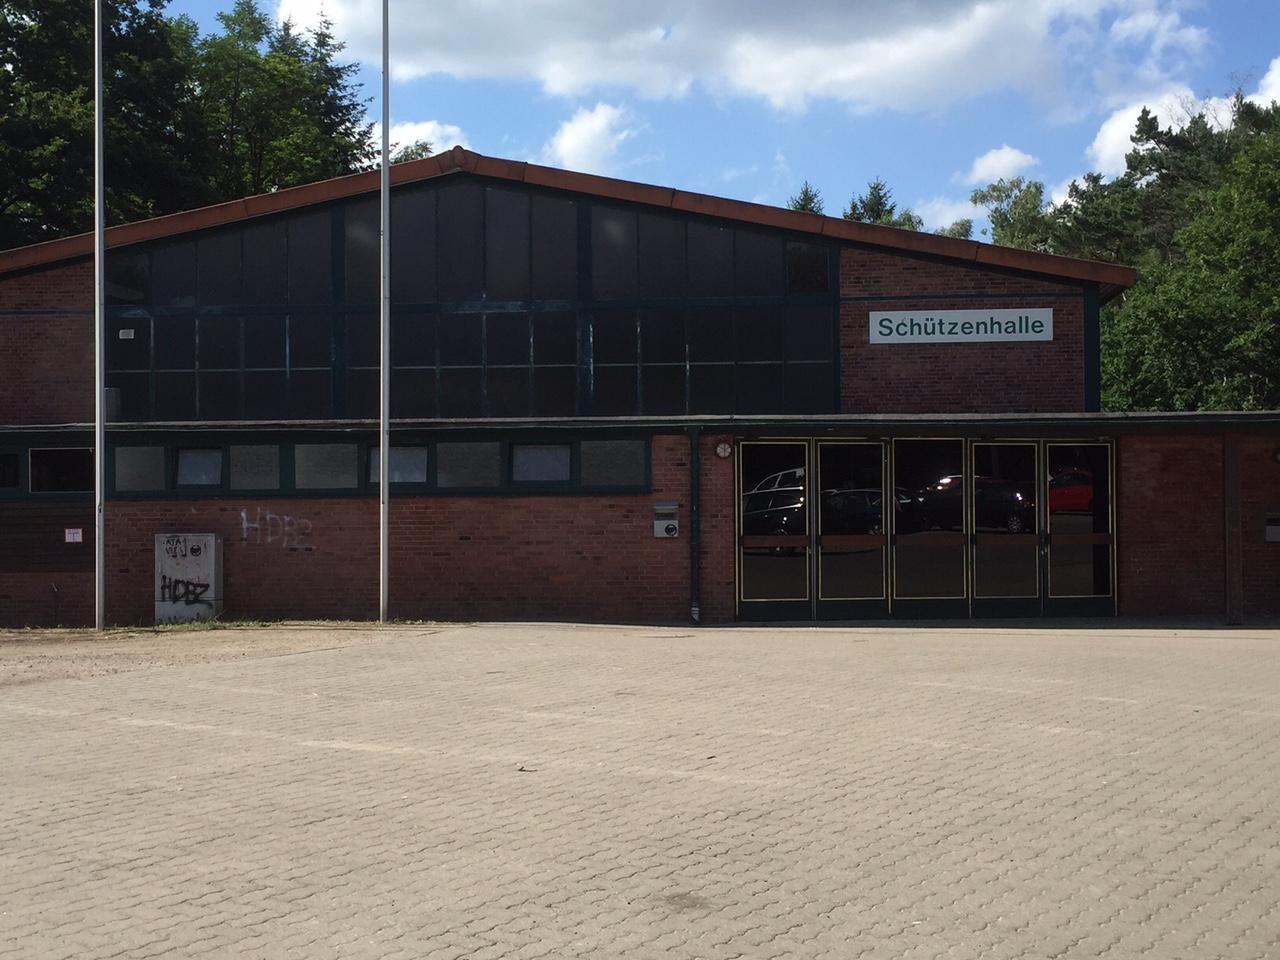 Schützenhalle Buchholz